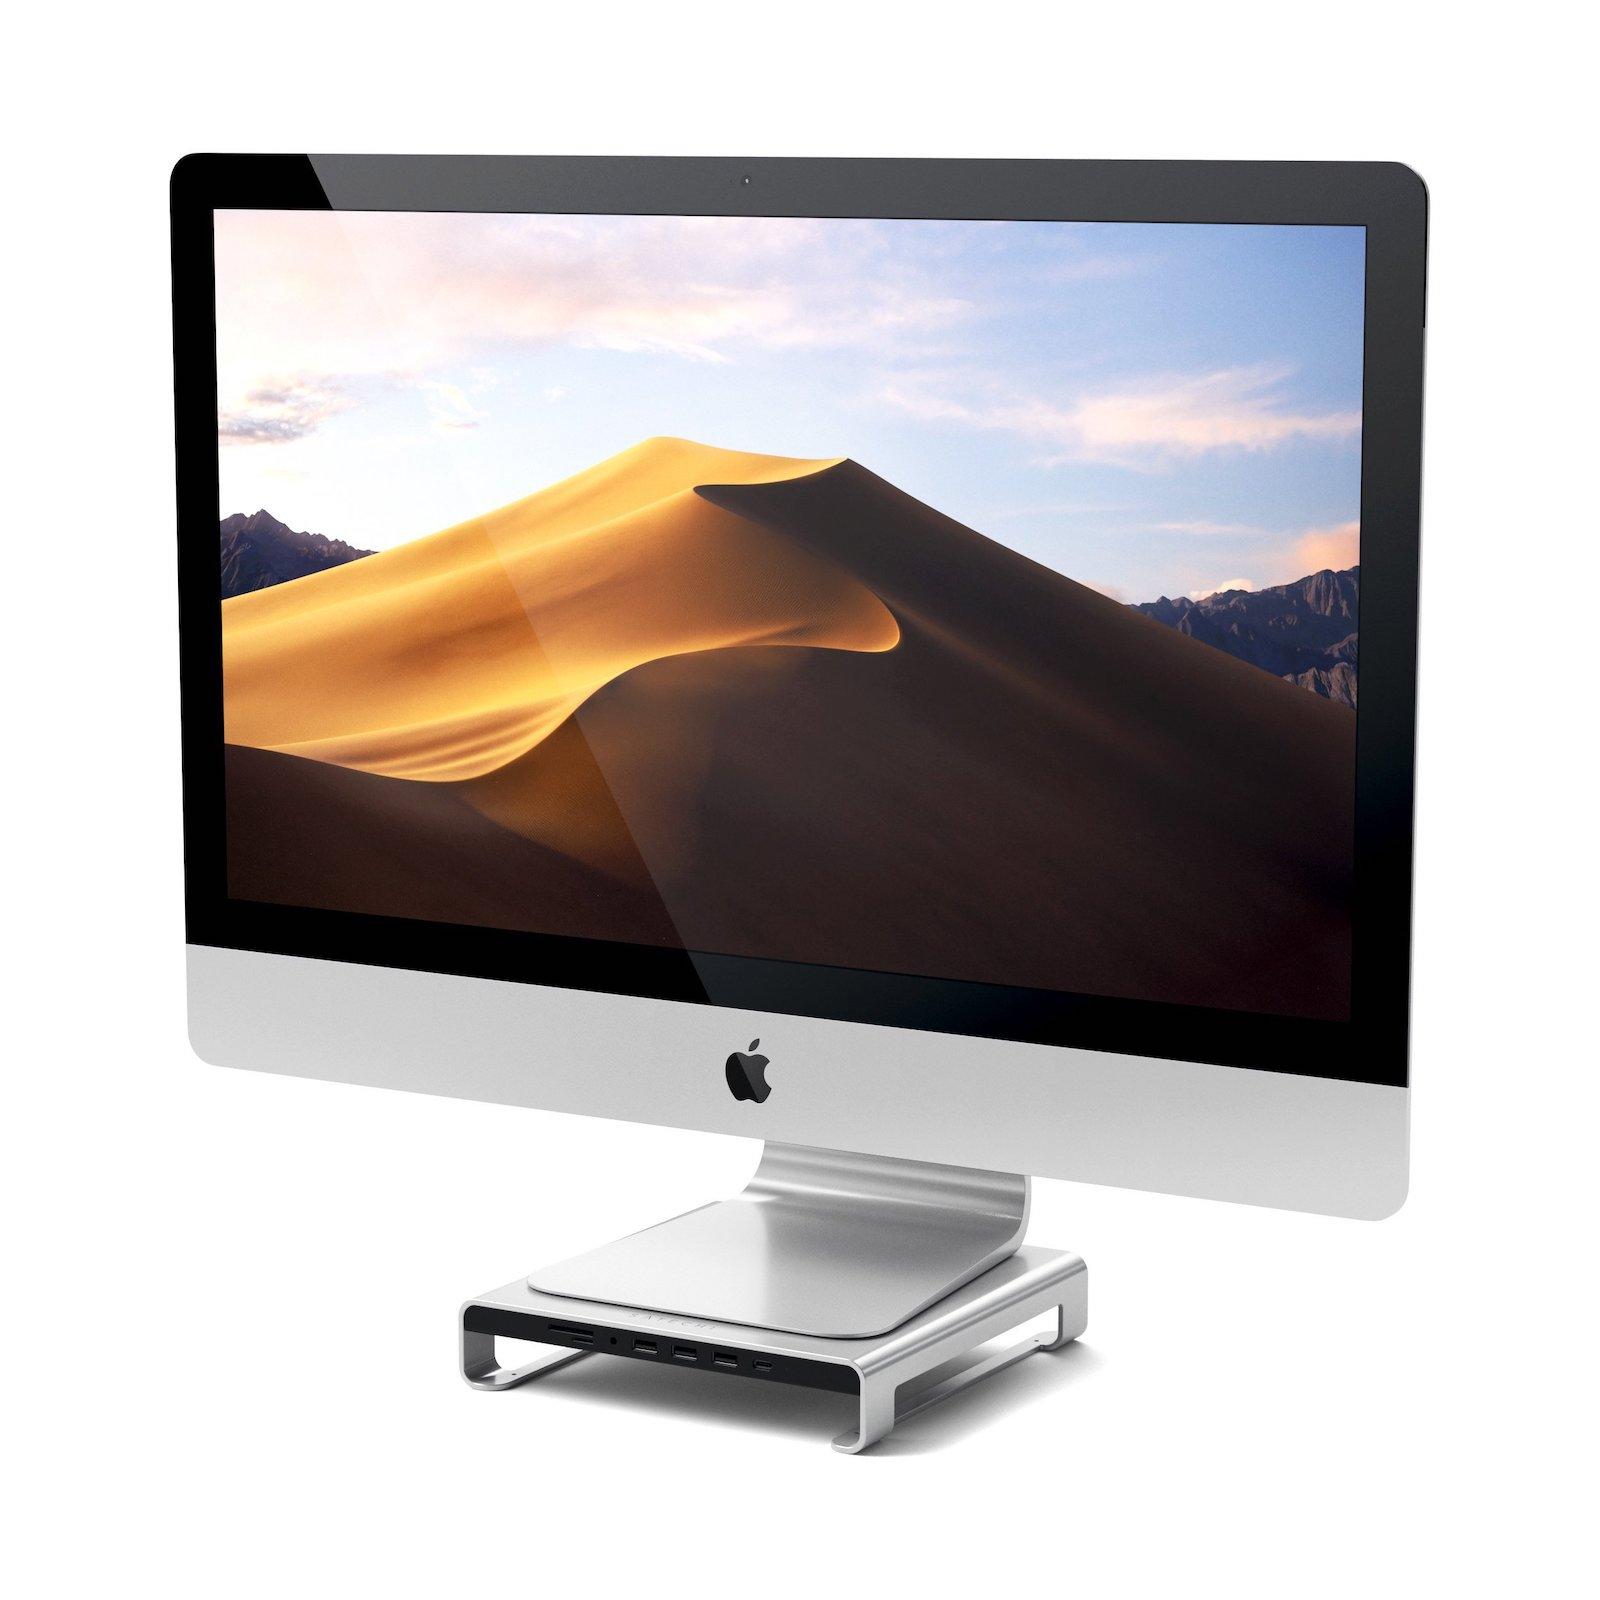 SATECHI iMac Stand SILVER 9